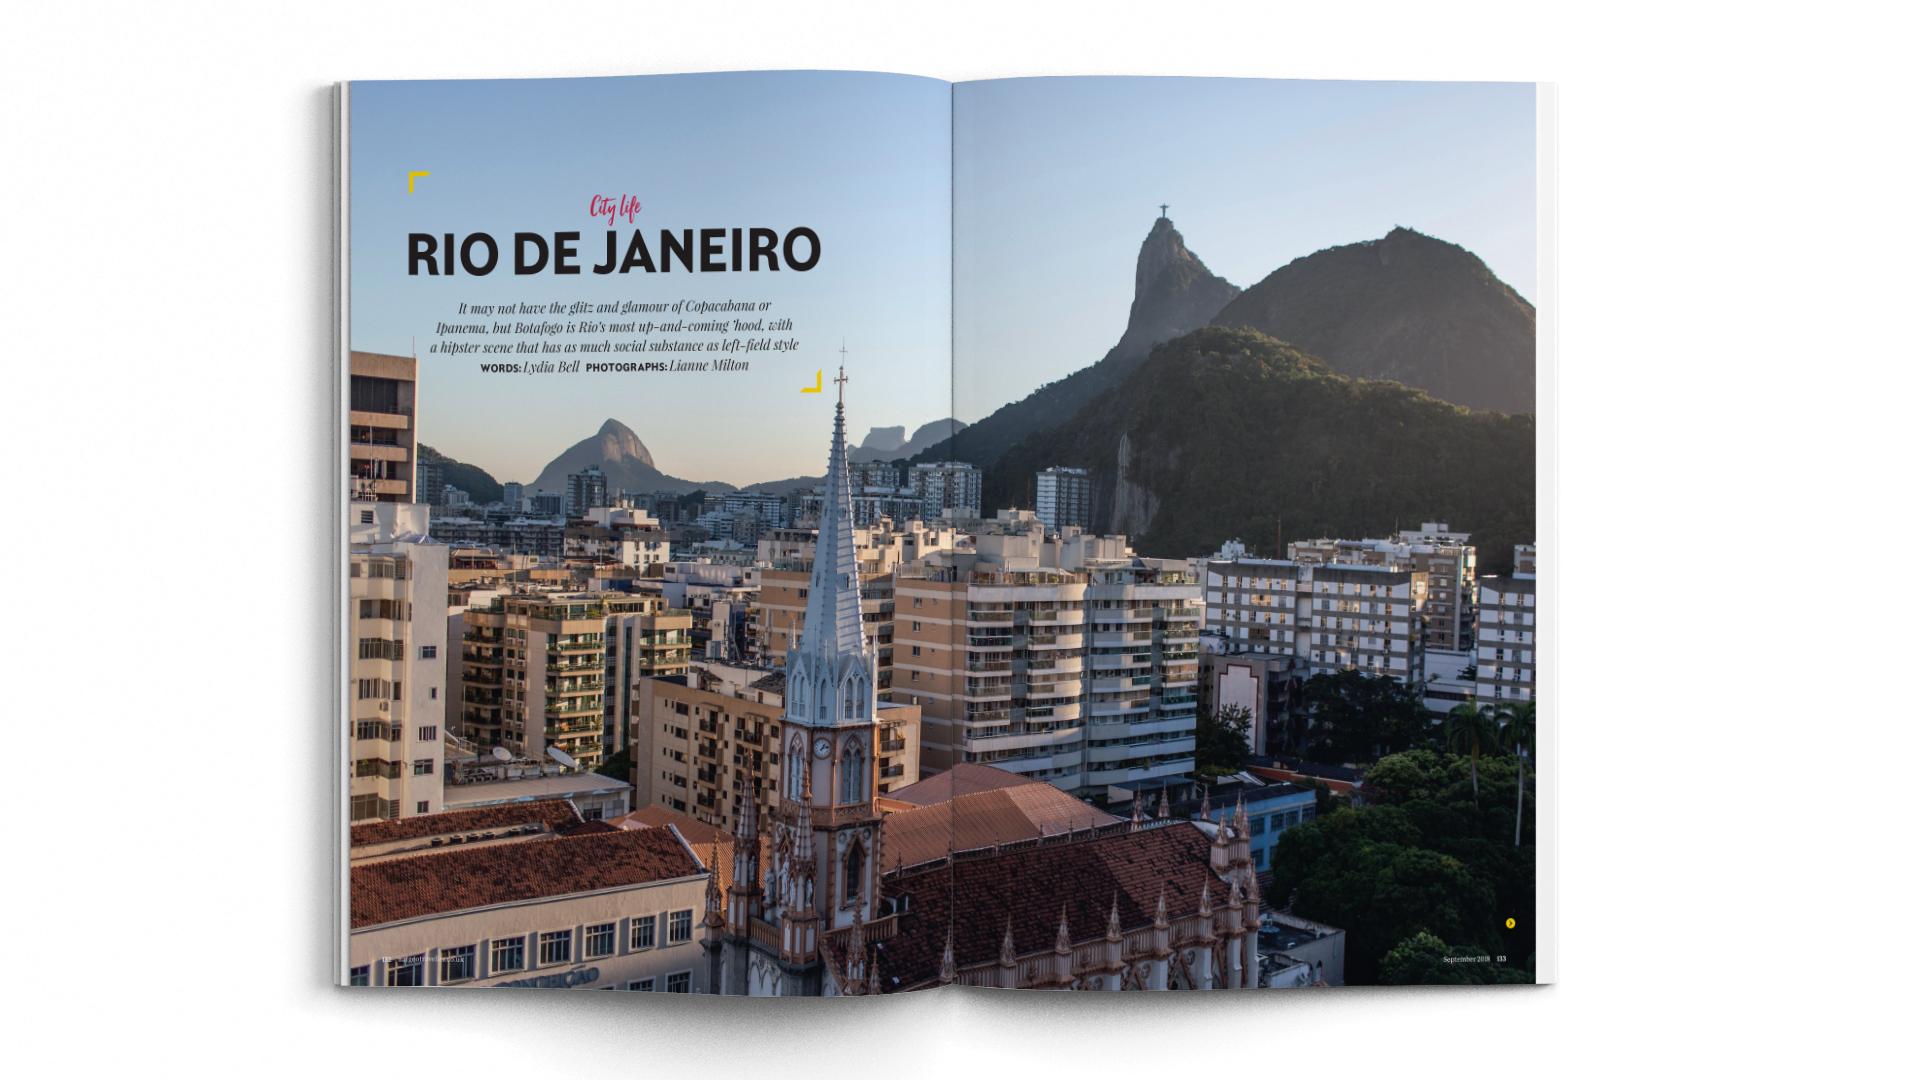 A4-Magazine-DPS-NGT-CL-Rio-1